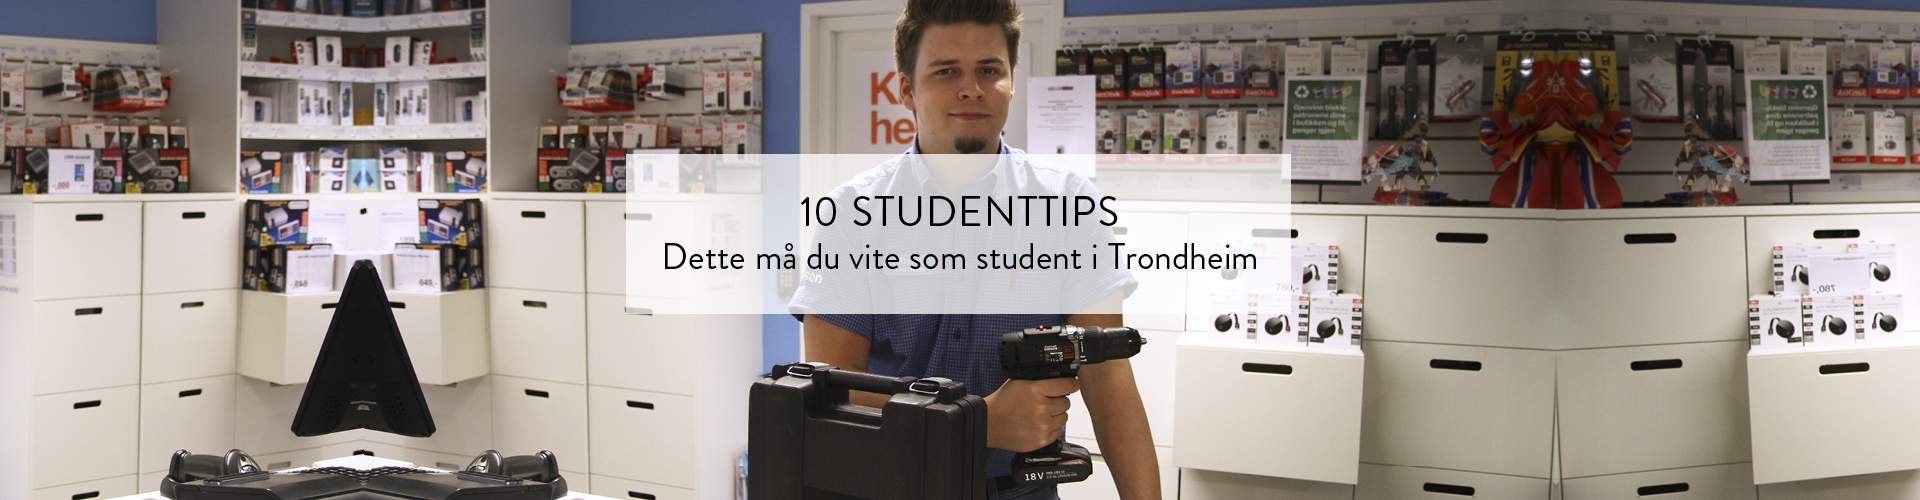 10 tips til studenter | Trondheim Torg